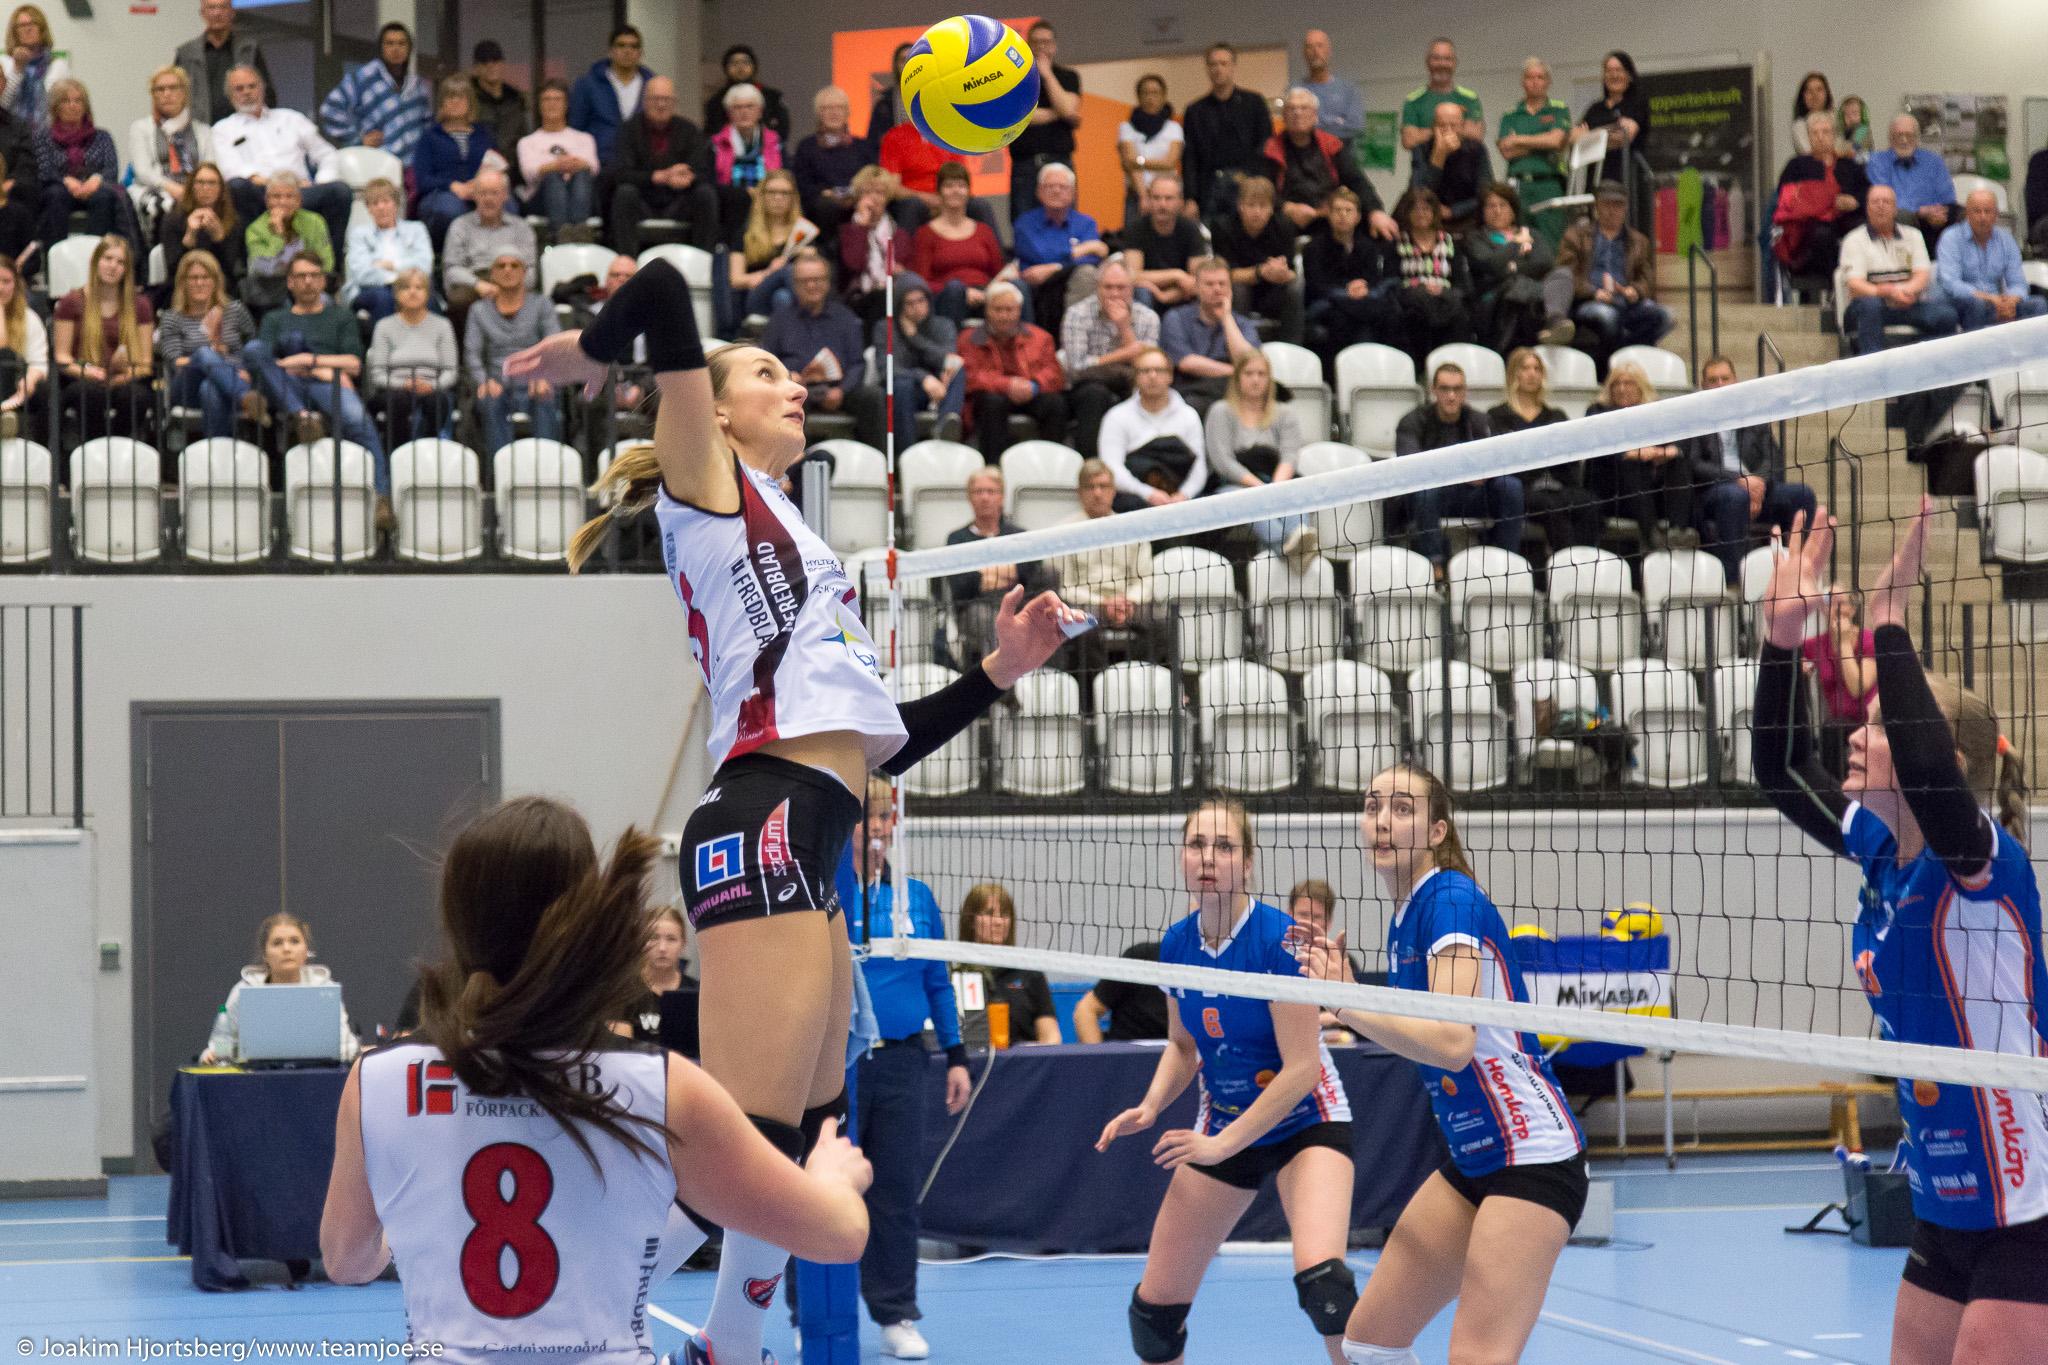 2016-03-25 Lindesberg Volley-Hylte/Halmstad VBK